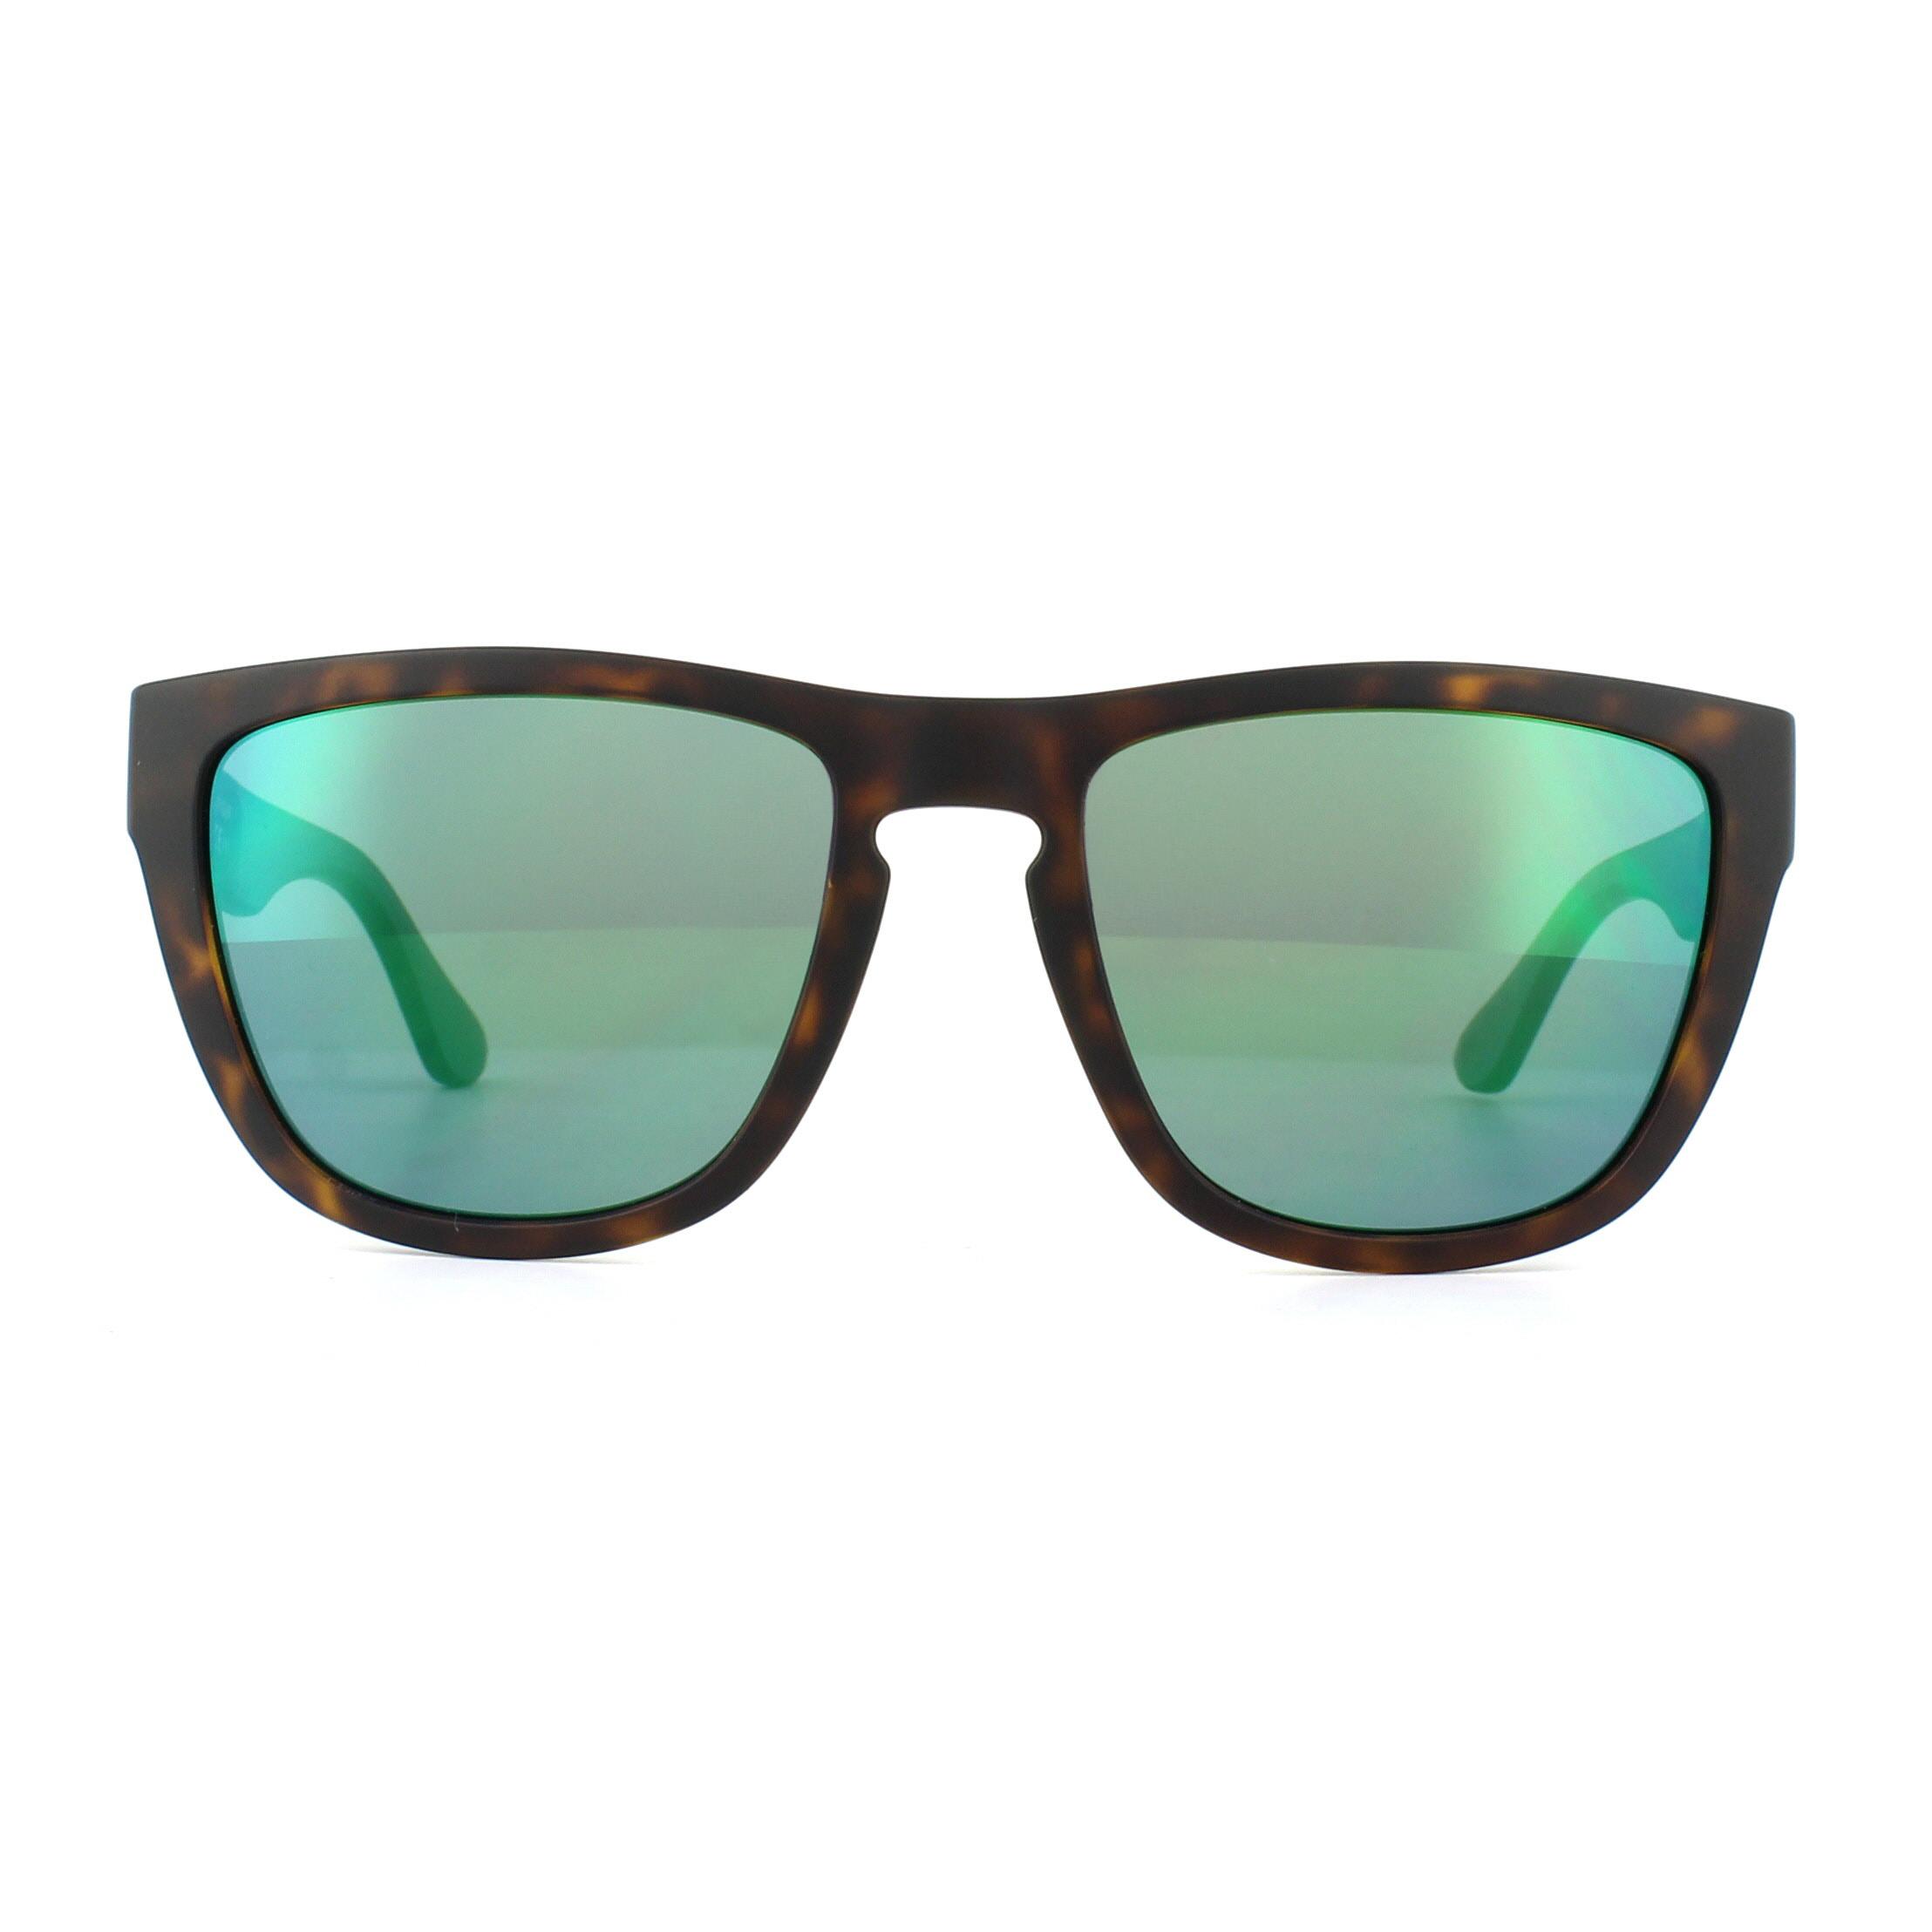 164e2e58 Cheap Tommy Hilfiger TH 1557/S Sunglasses - Discounted Sunglasses